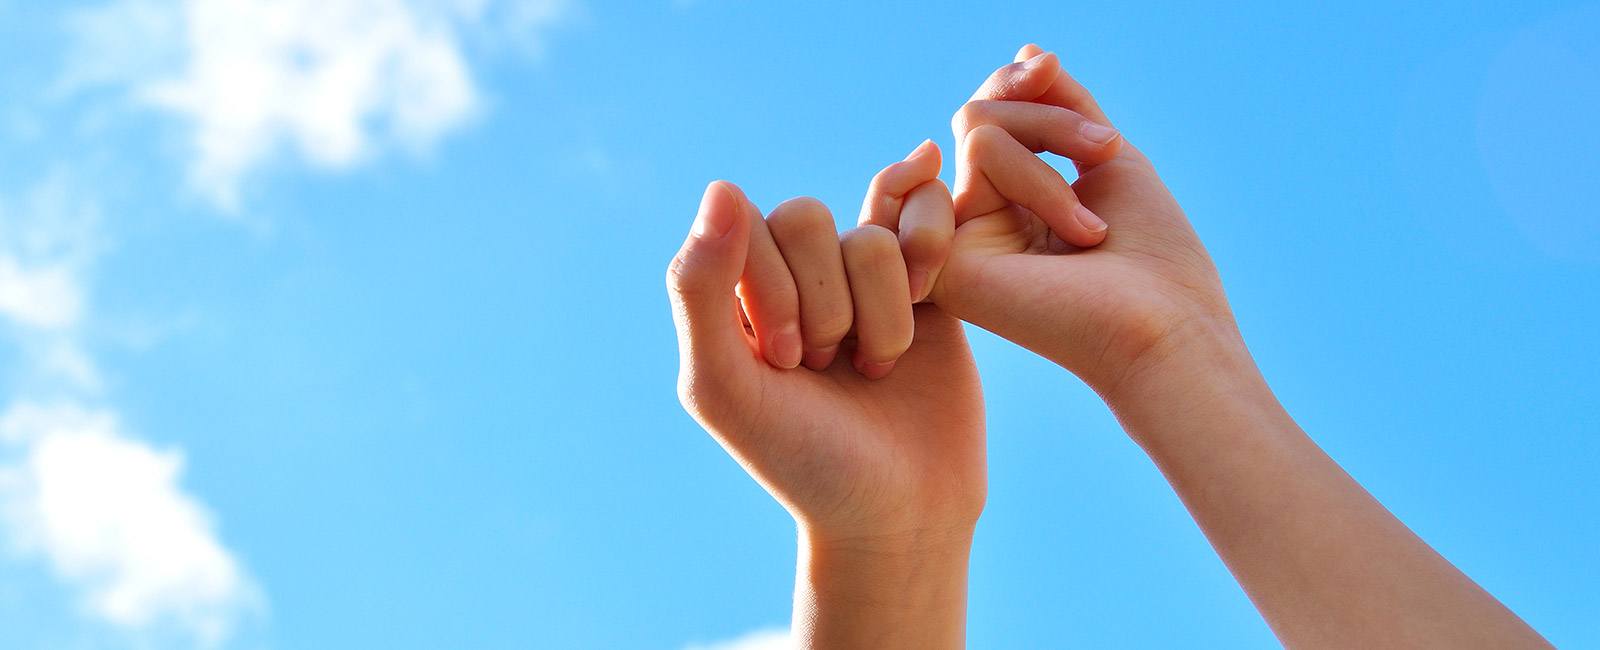 pledge promise hands